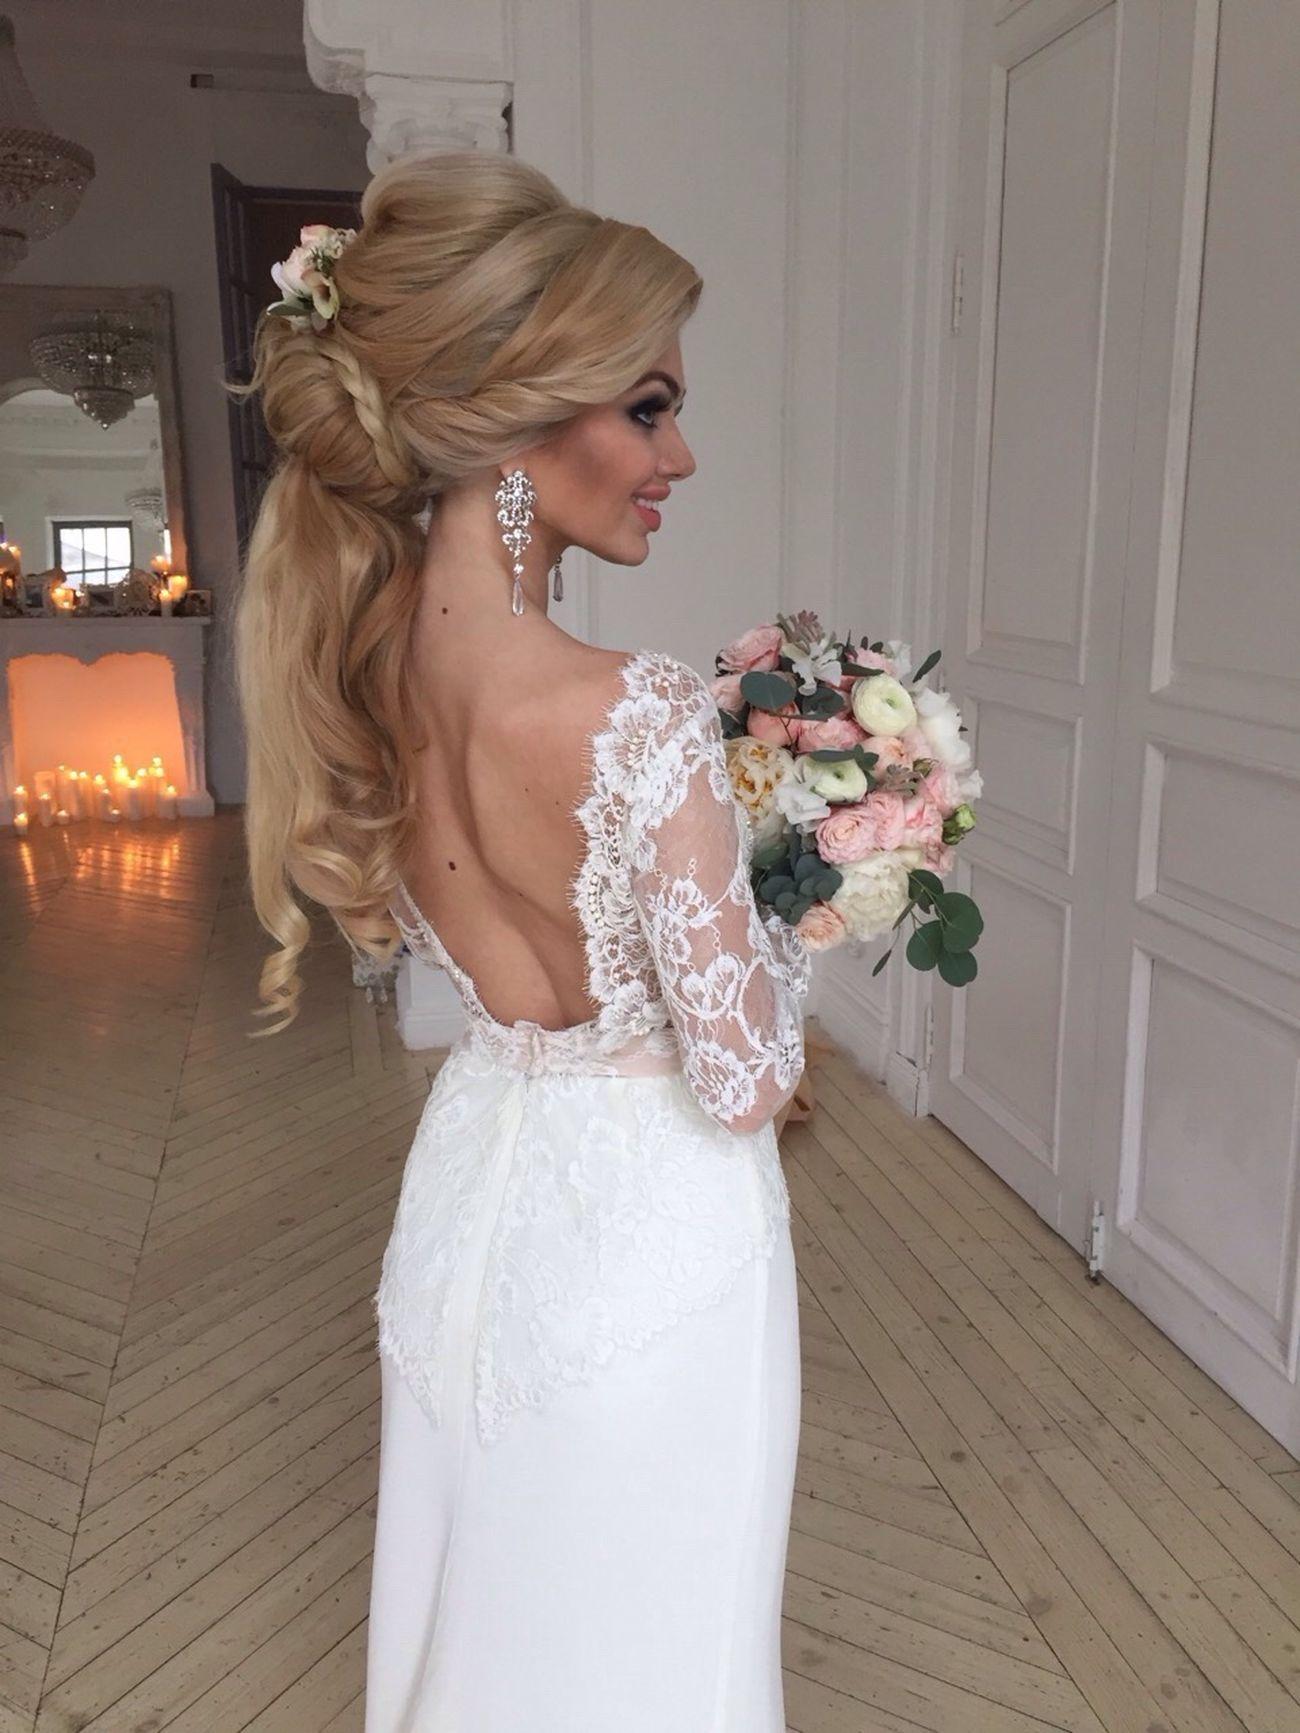 Wedding2015 Blonde Girl Pretty♡ Fashion Hair Wedding Photos Wedding Photography Long Hair Novia2015 Redlips Happy Wedding